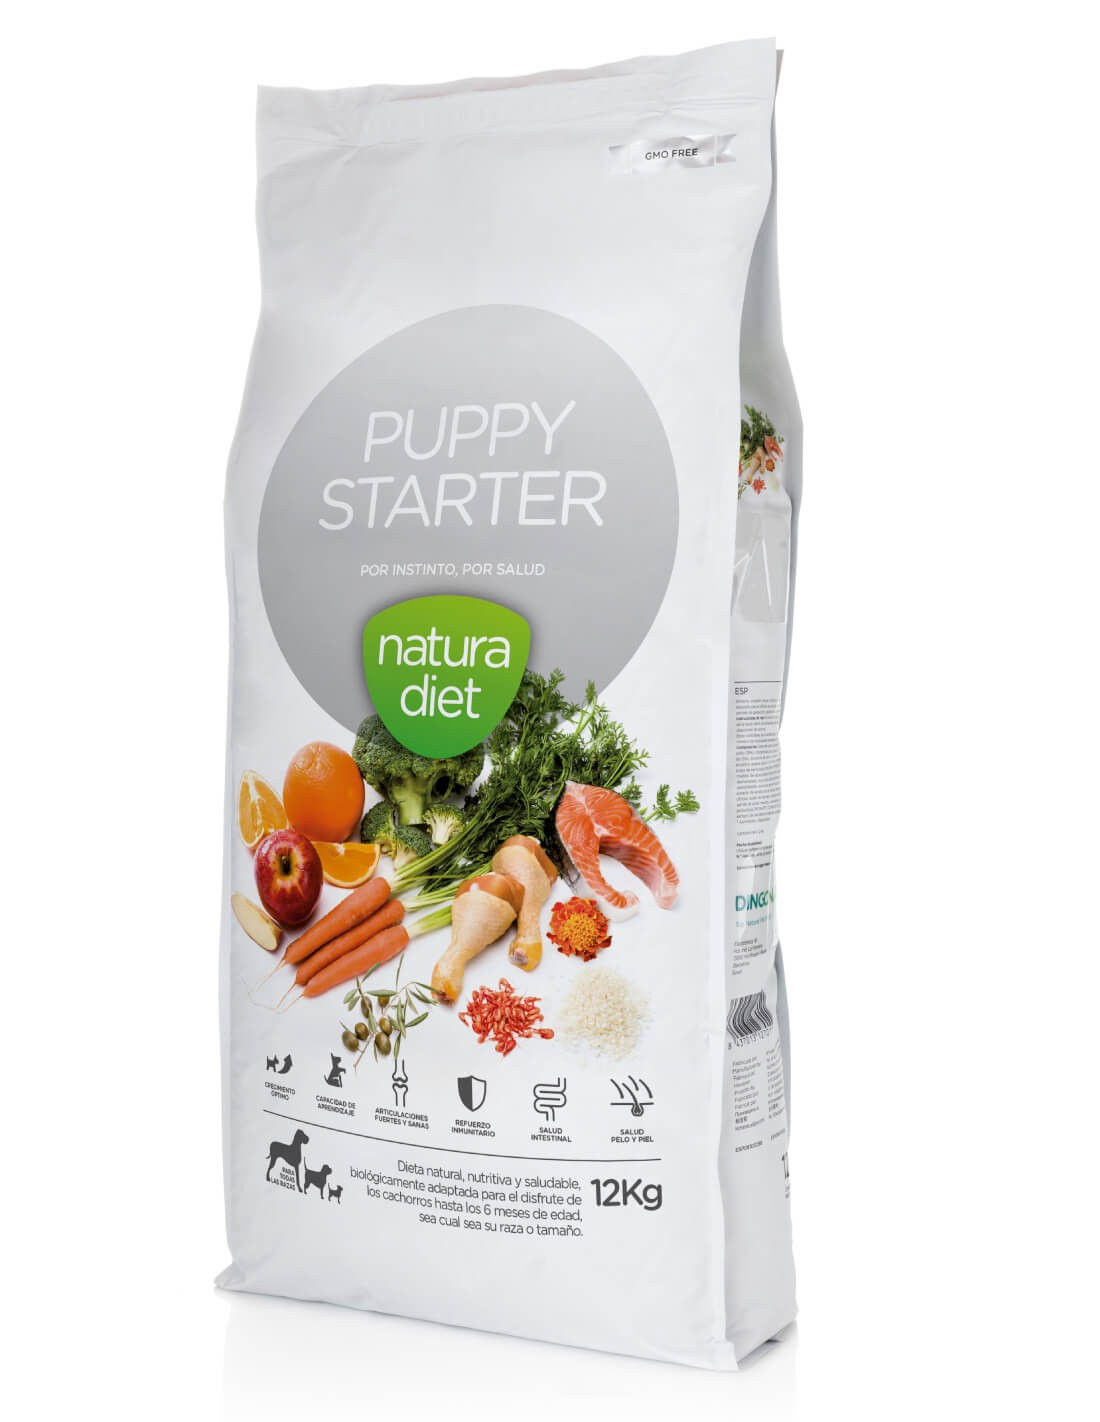 NATURA DIET Puppy Starter - Cachorro 0-6 meses